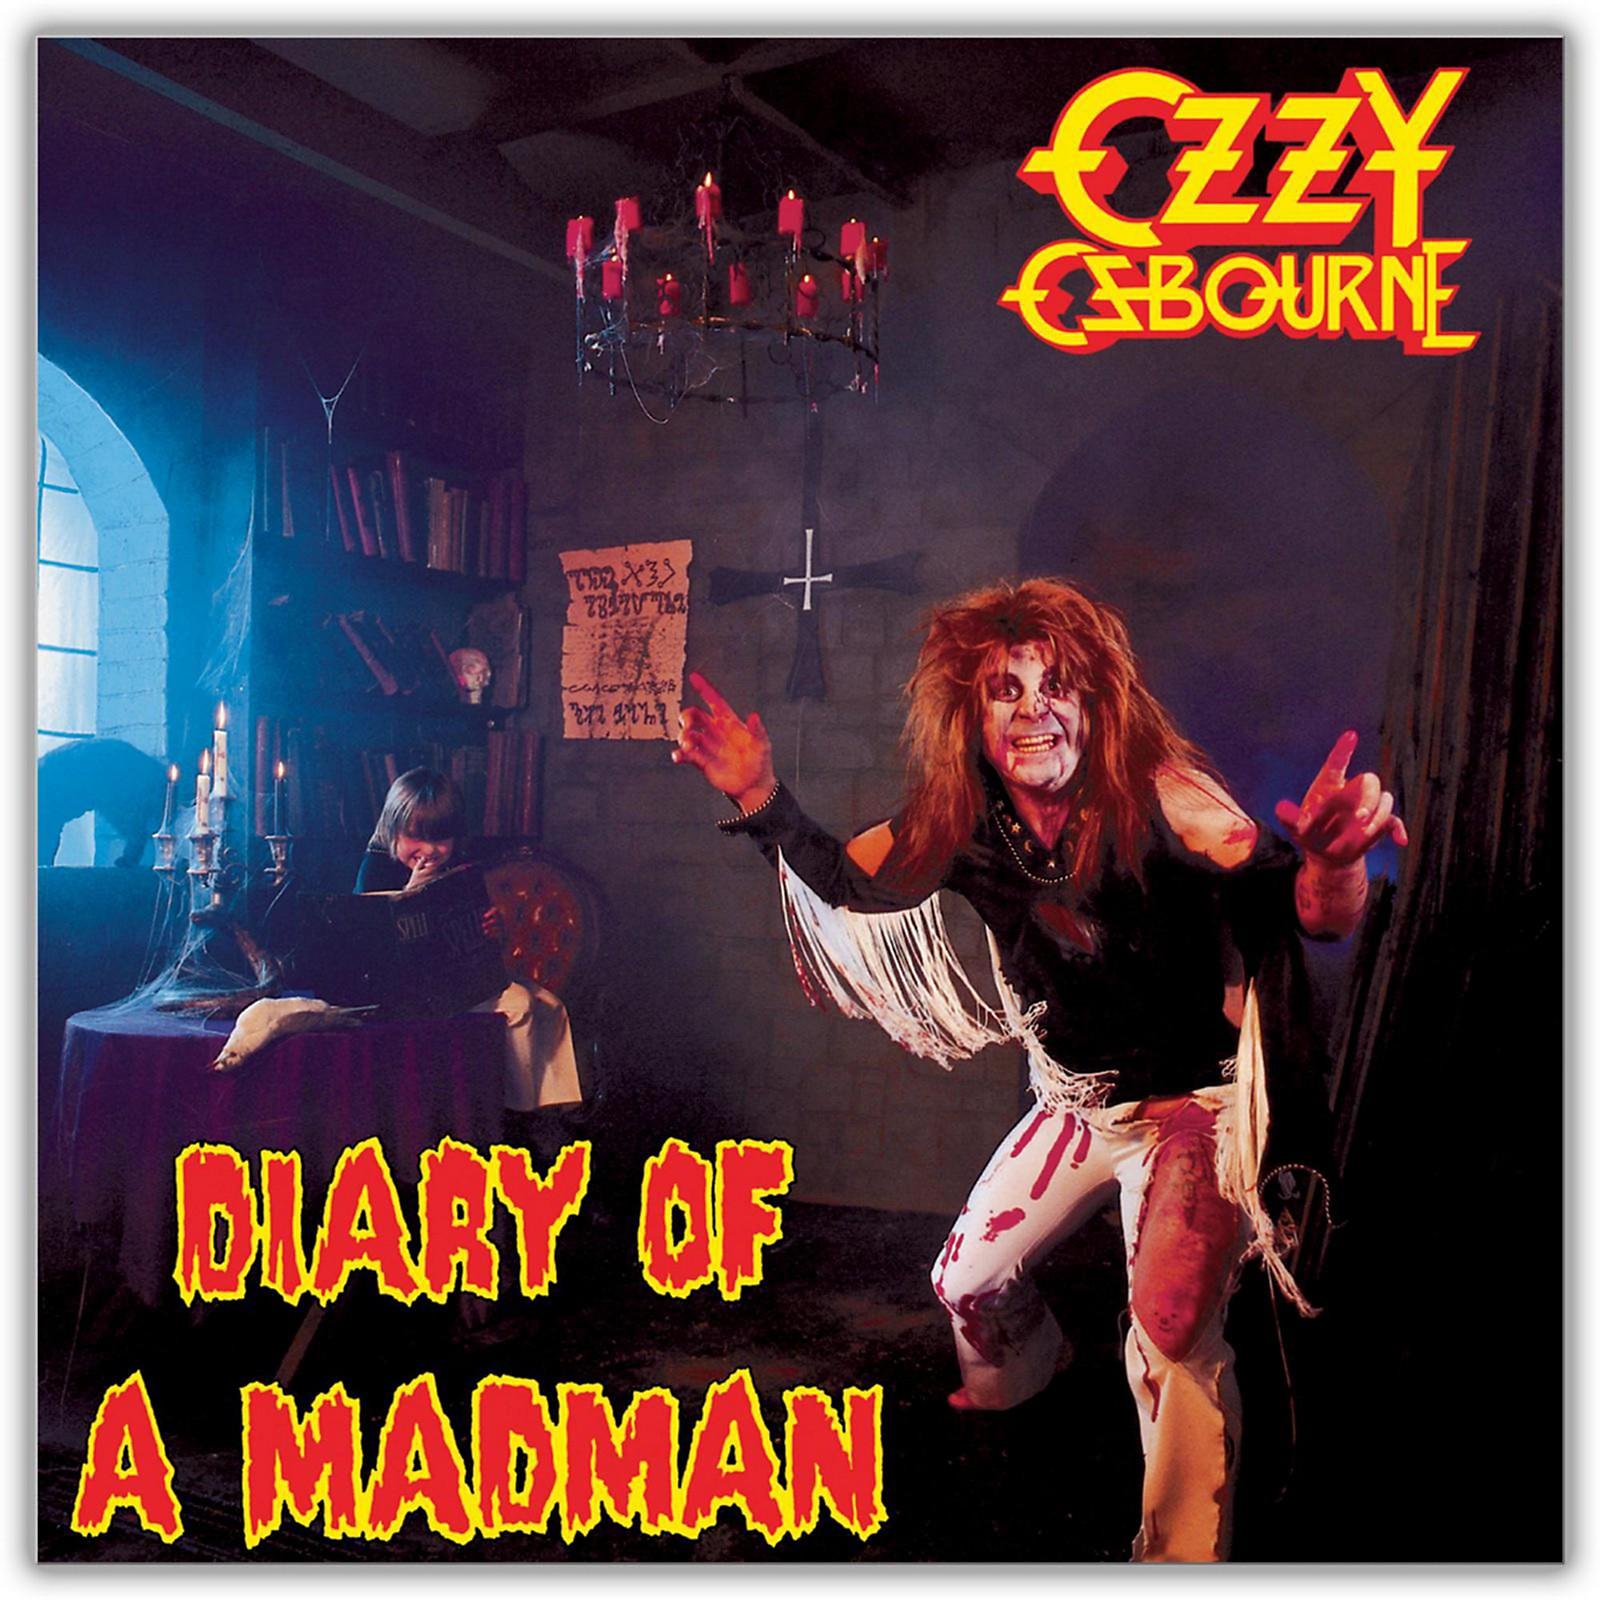 Sony Ozzy Osbourne - Diary of a Madman Vinyl LP